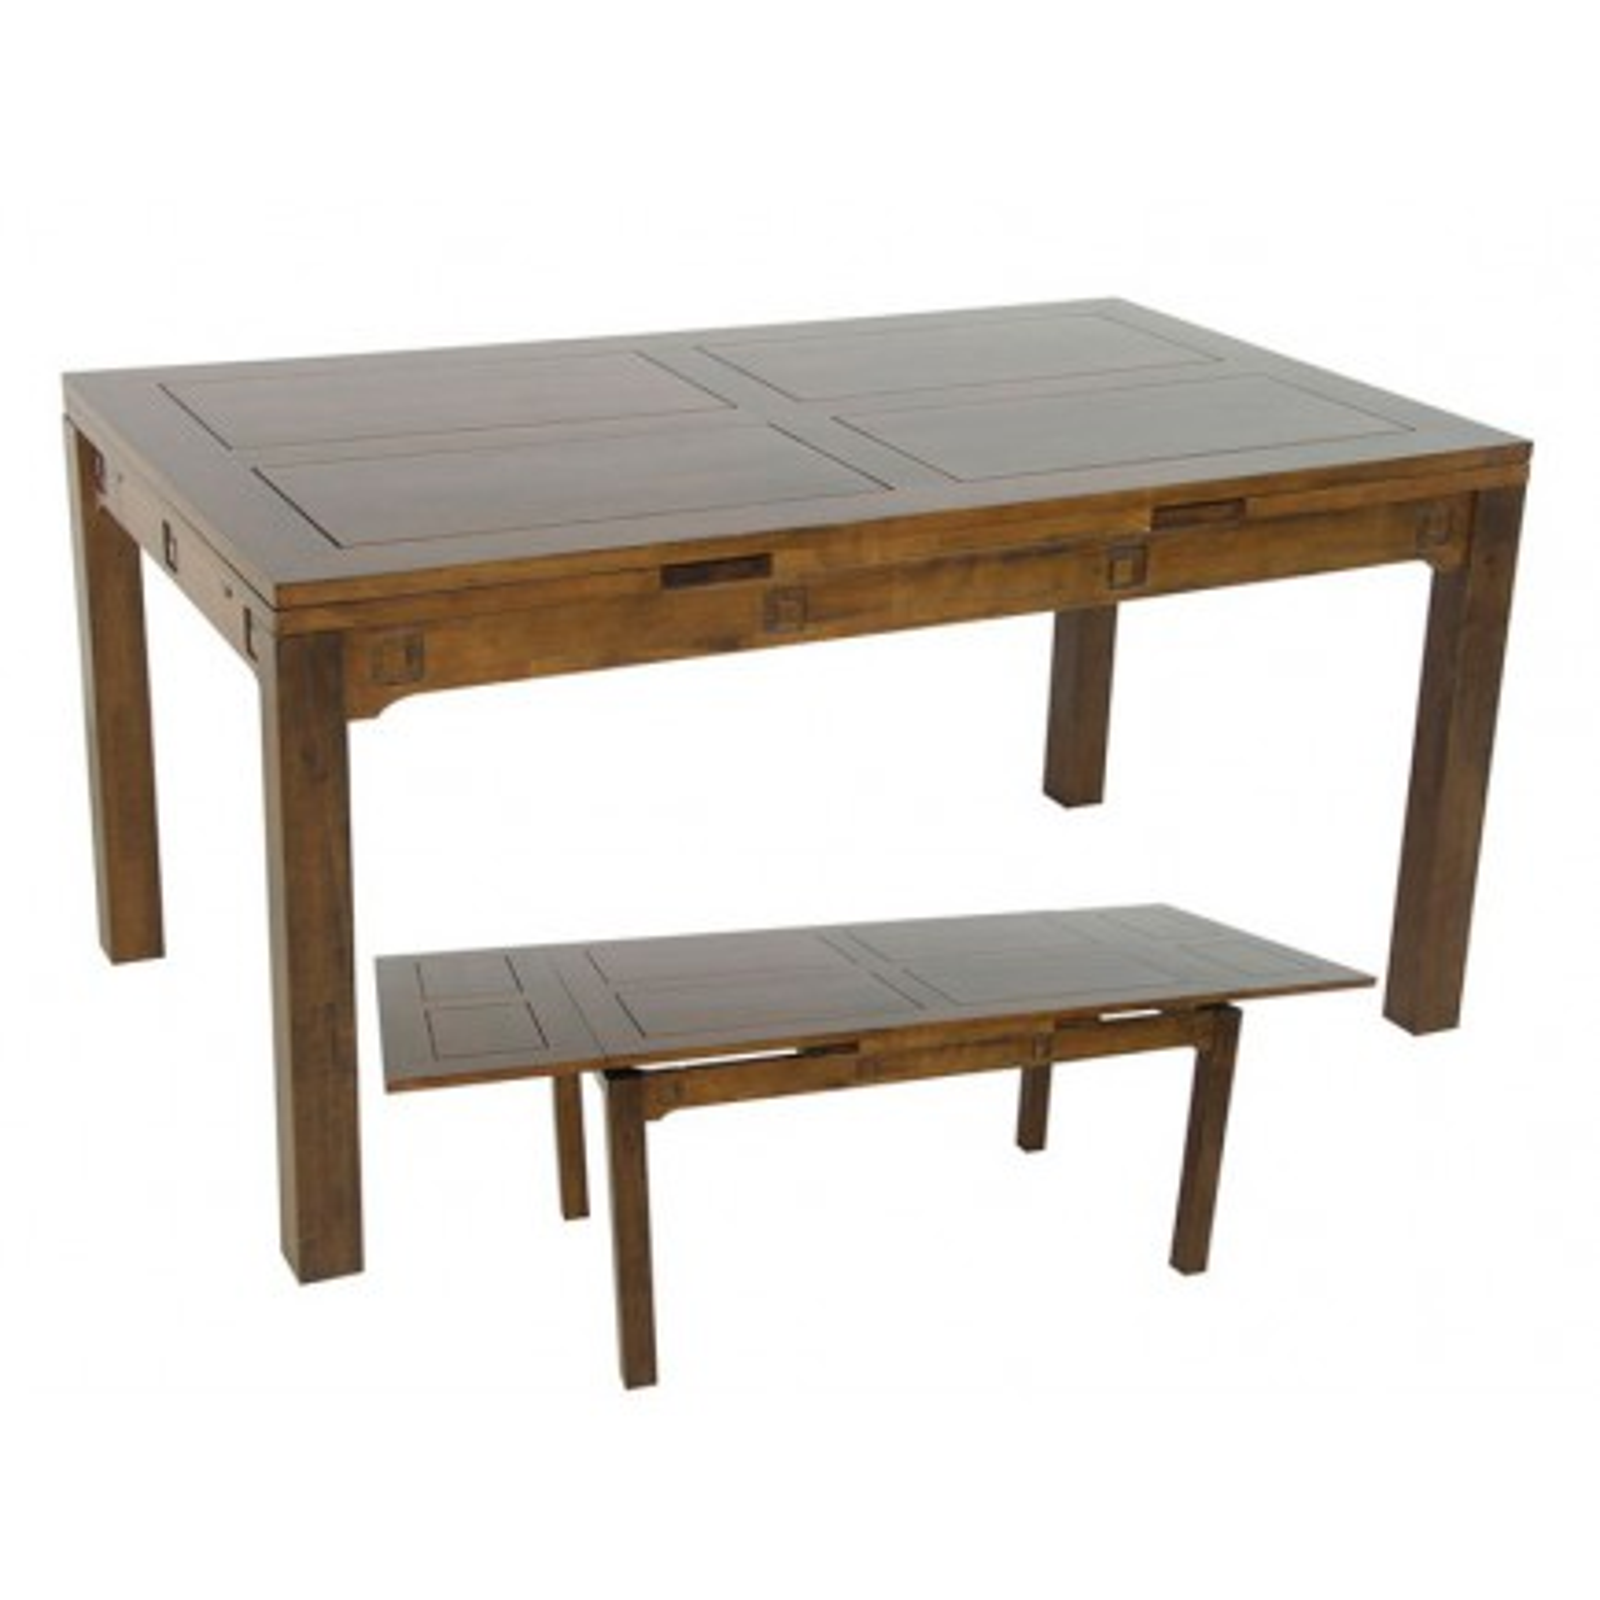 Table Séjour Tanoa Hévéa - mobilier bois massif